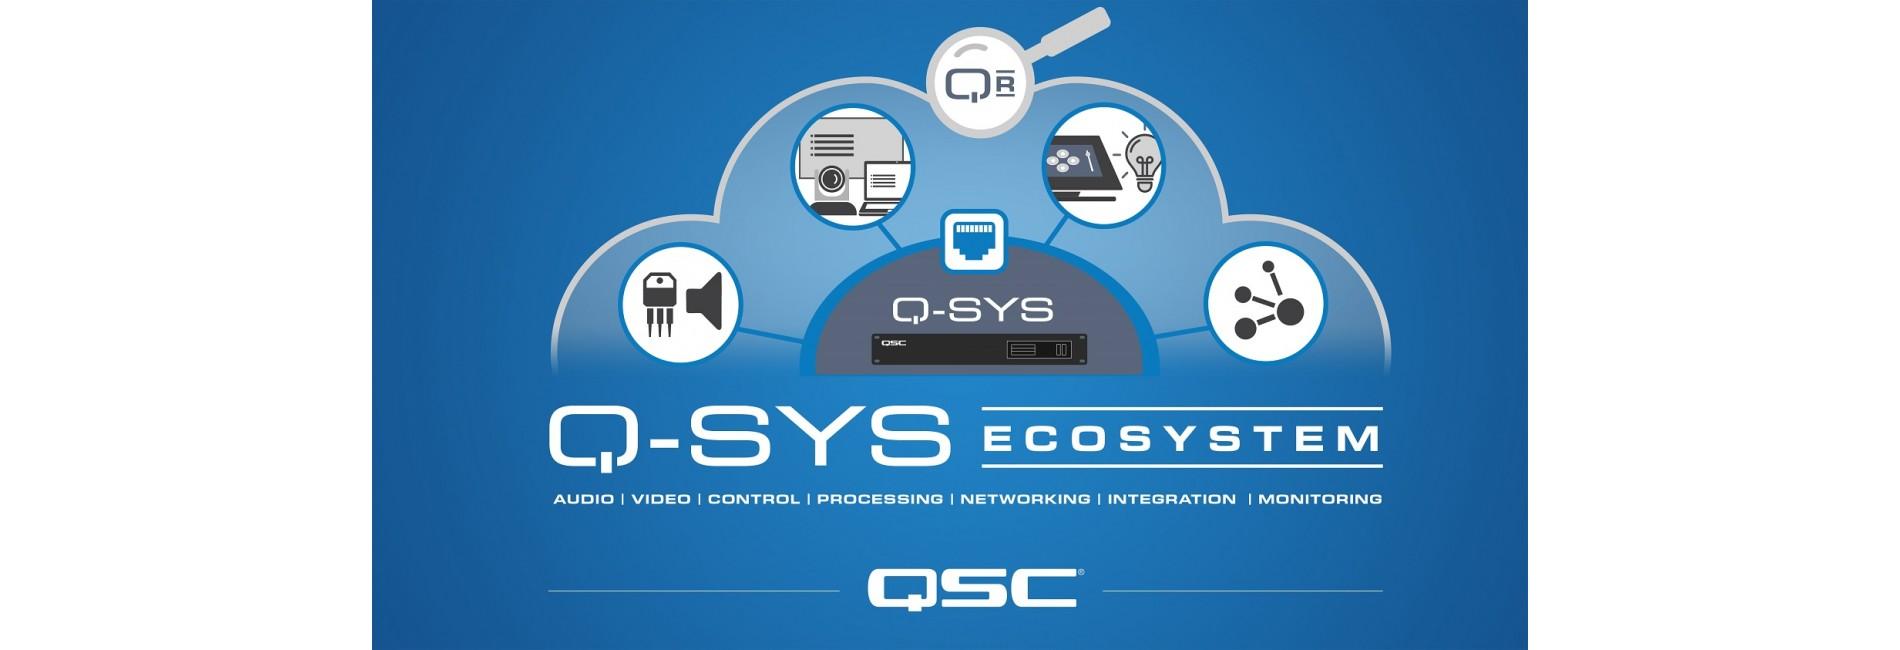 QSYS Ecosystem